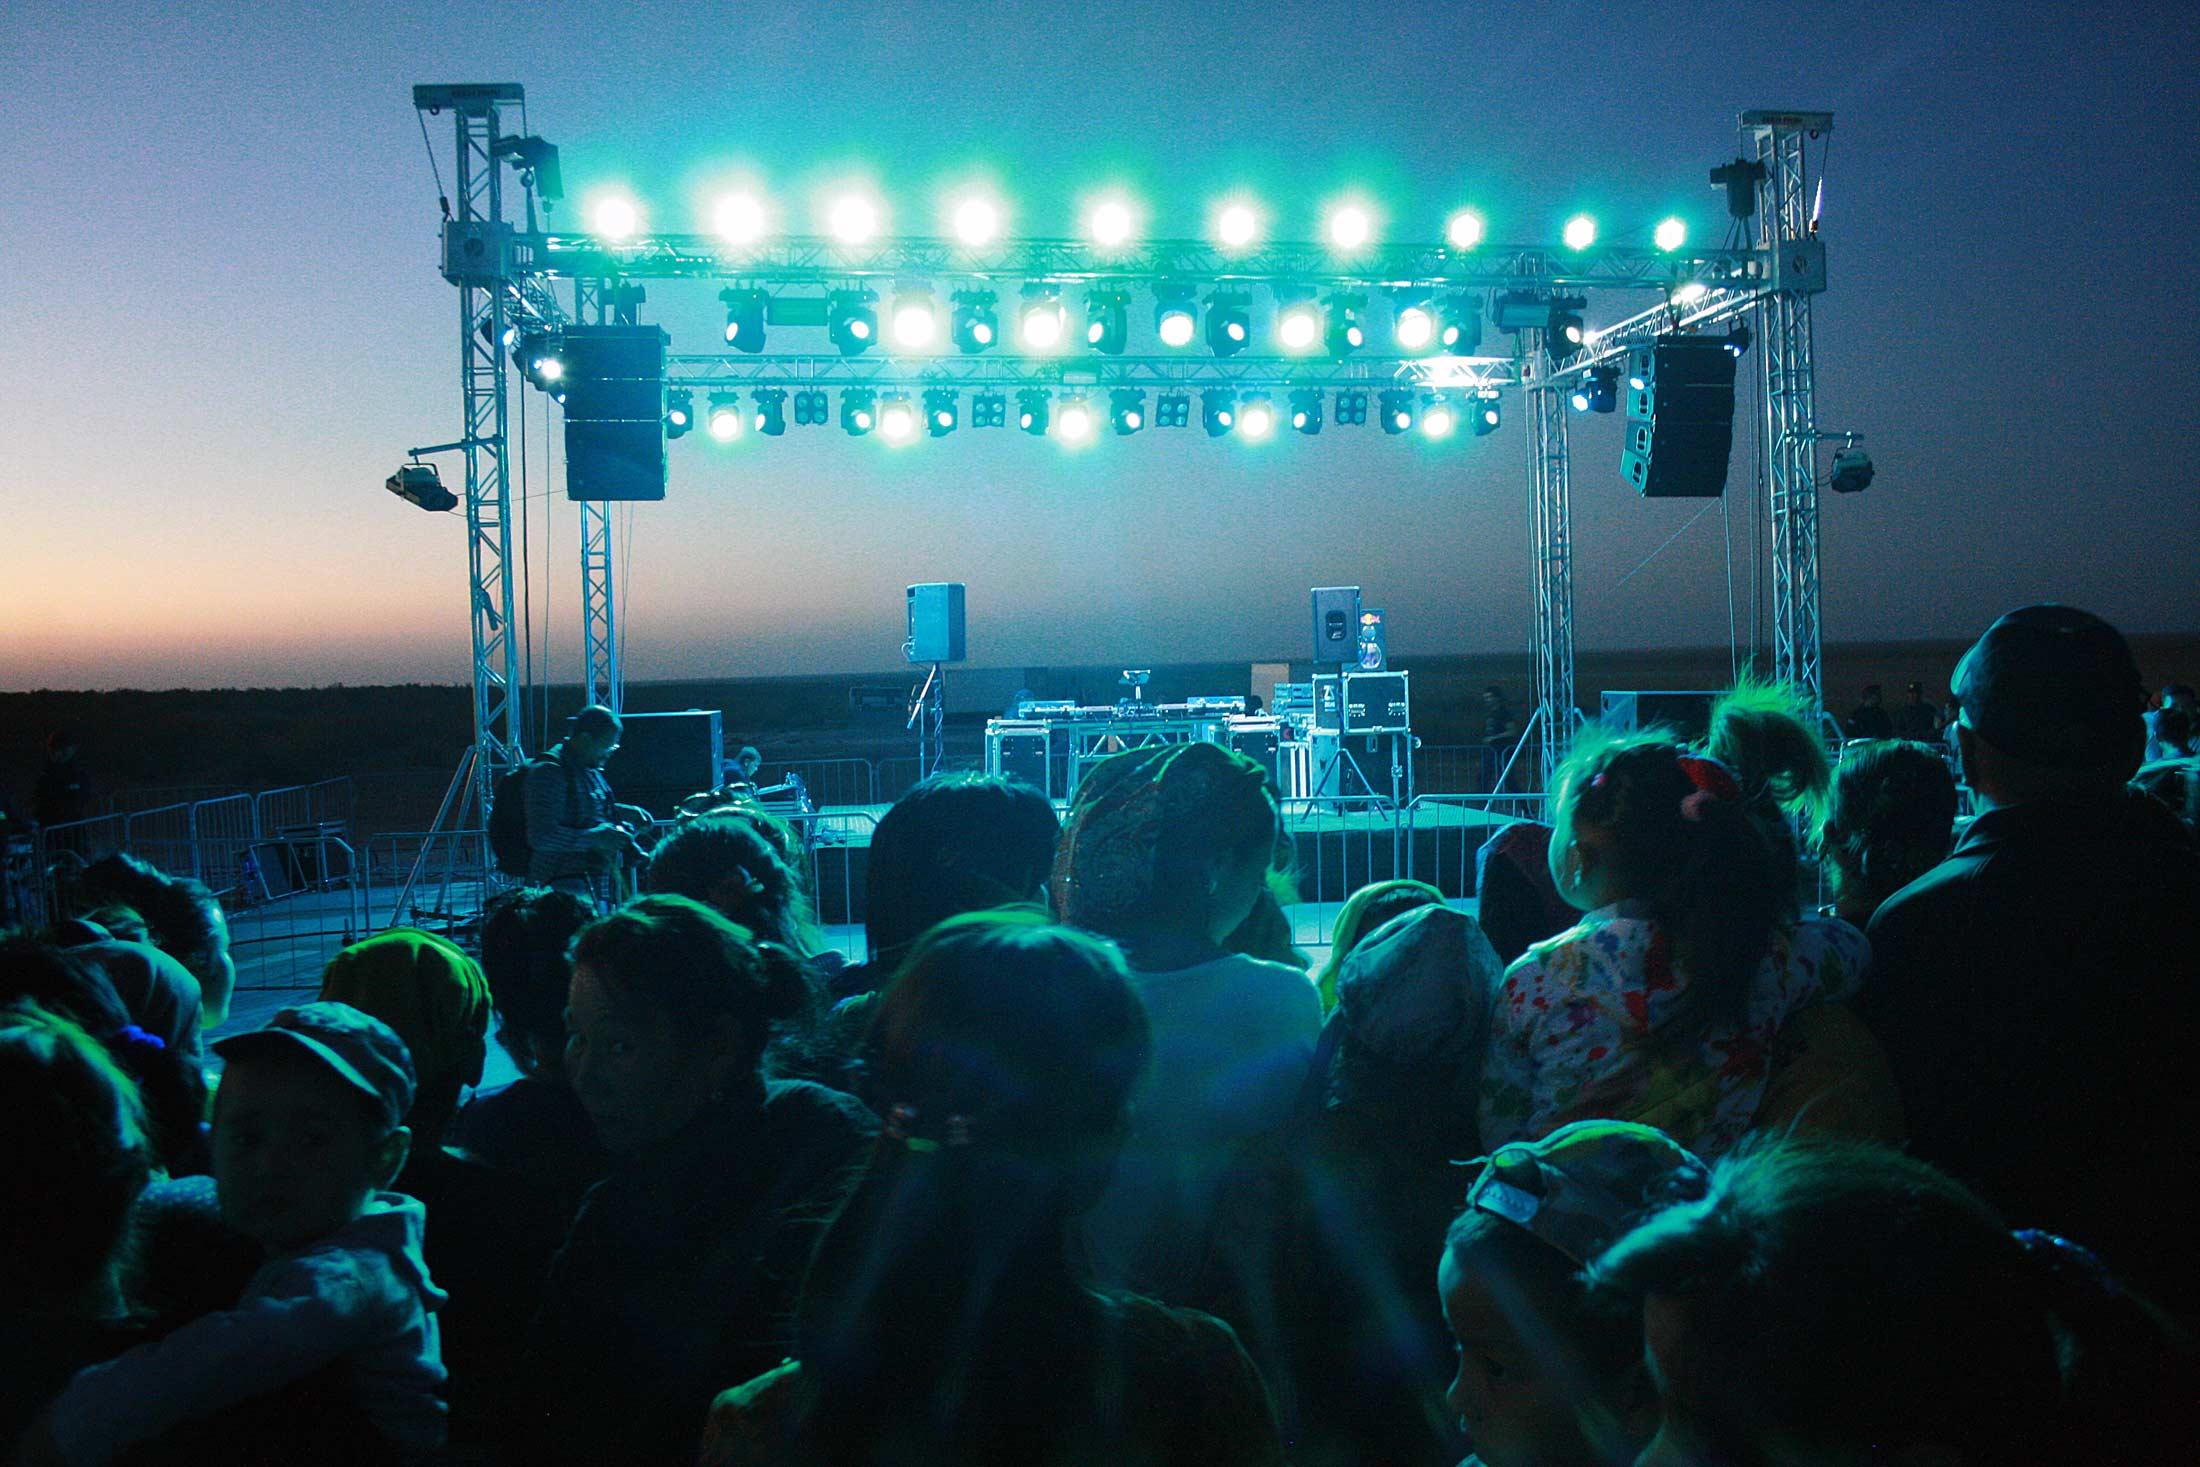 Dancing Uzbekistan Electronic Music Festival Techno Underground